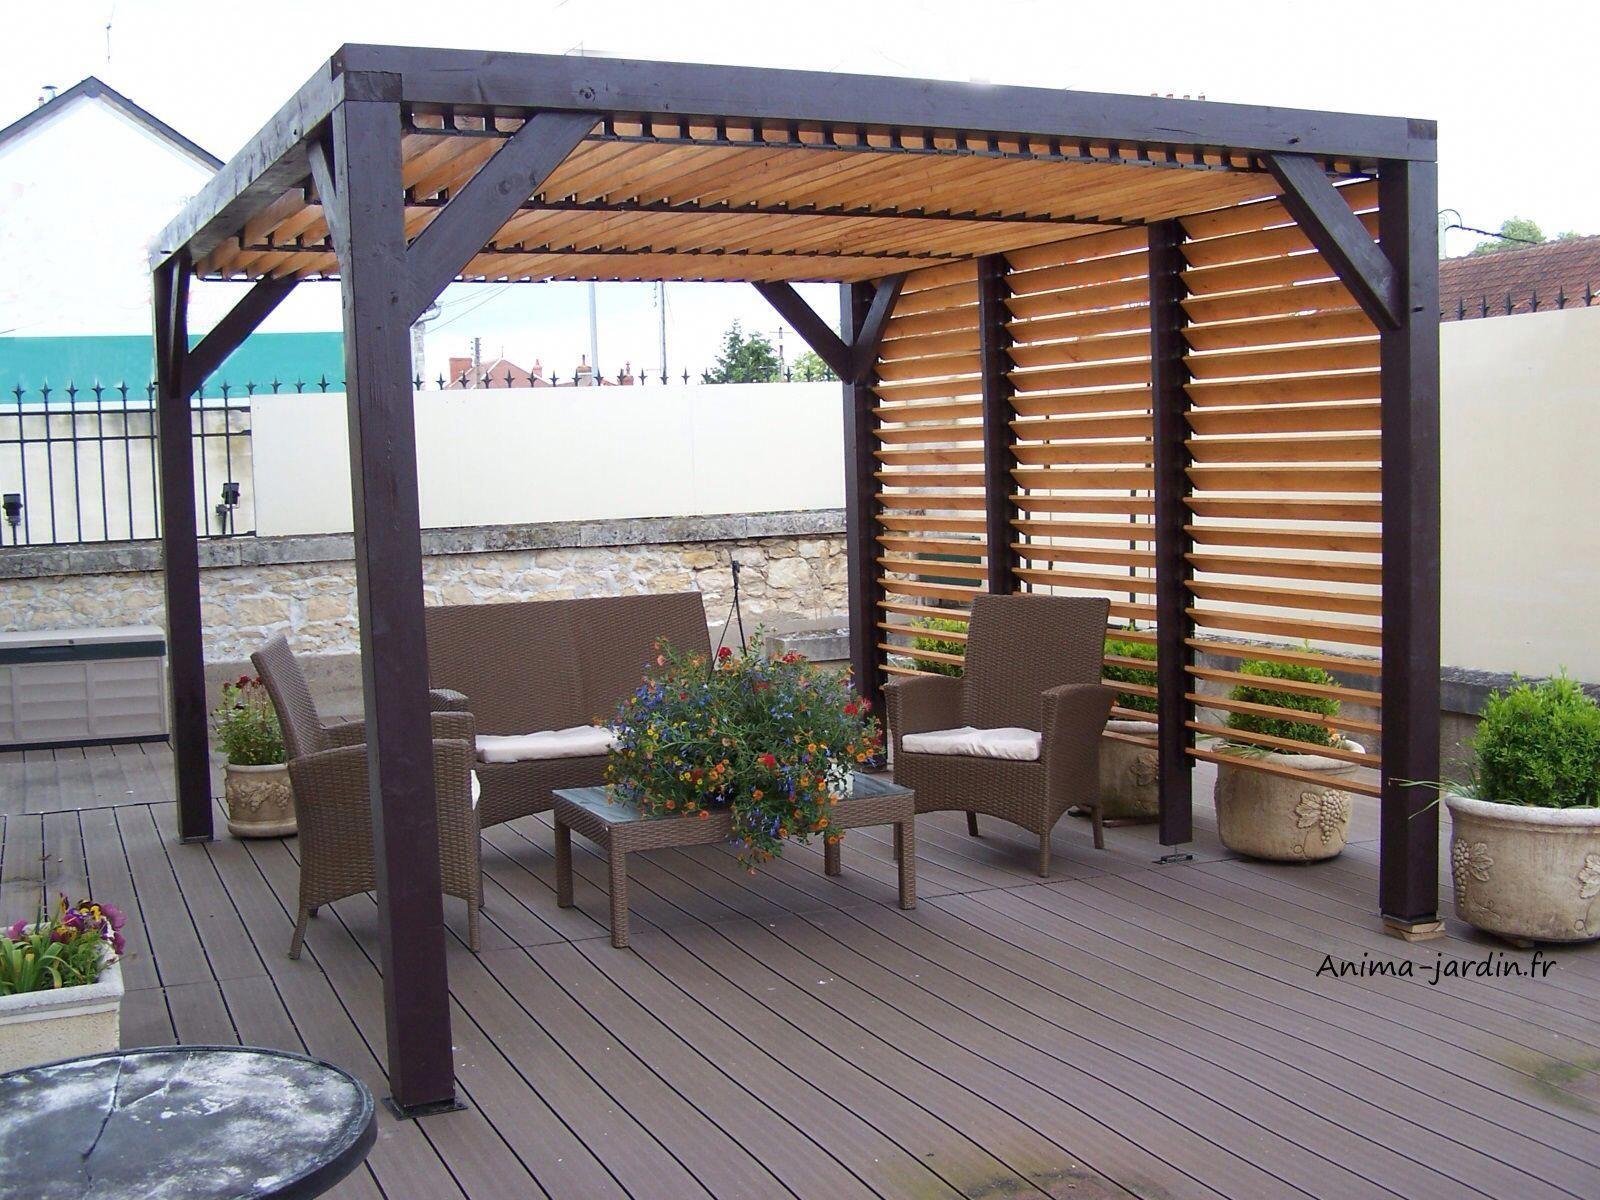 Pergola Attached To House Plans #Pergolaoverhottub ... tout Couverture Terrasse Amovible